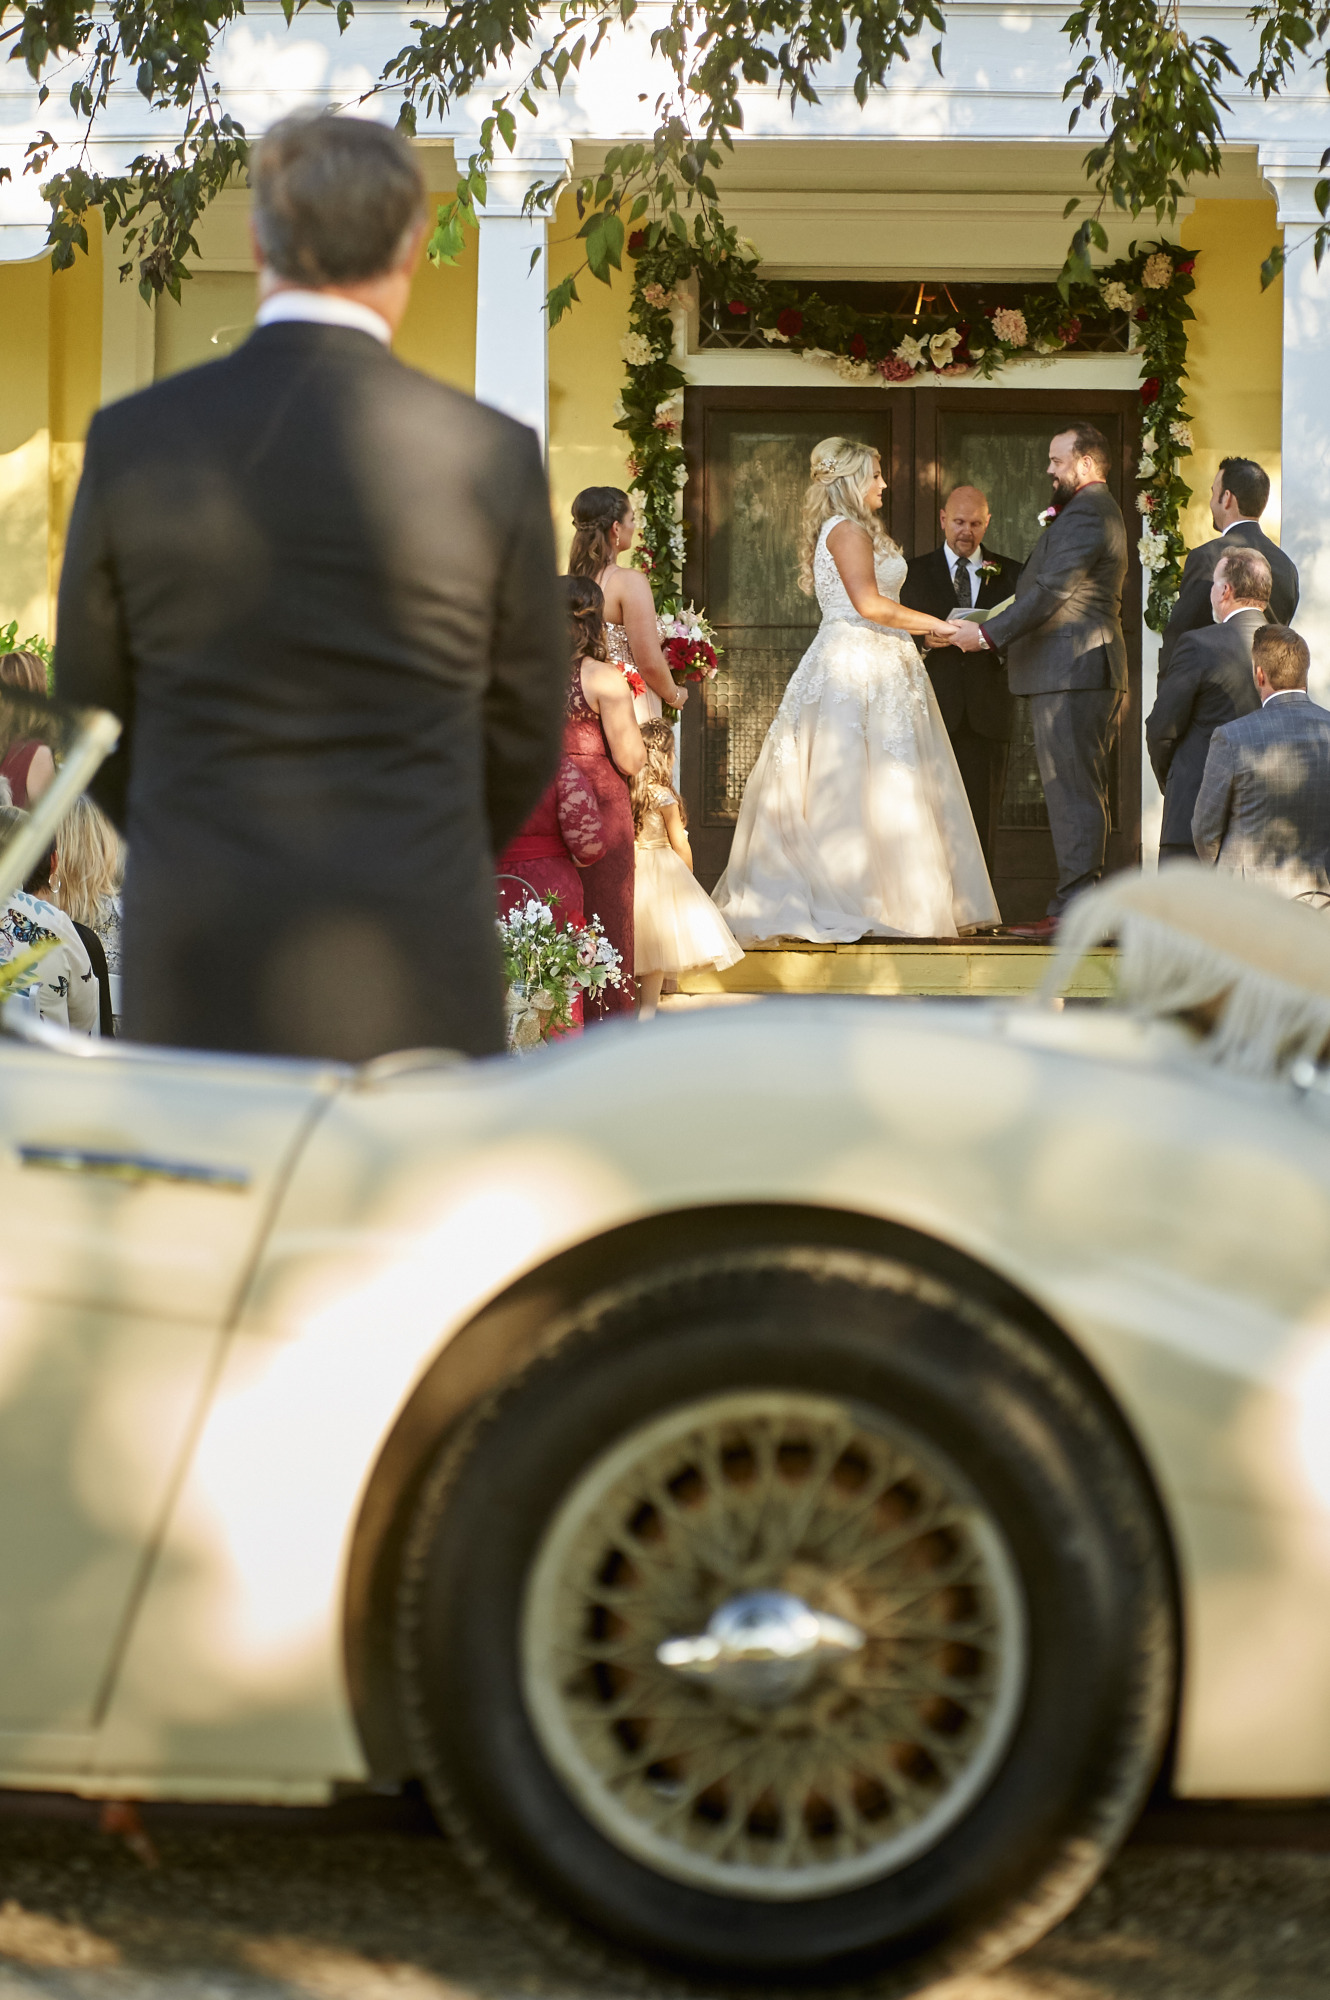 Taylor and Cody - Taylor Mansion and Crystal Ball Room - Taylor Texas - Wedding - 017